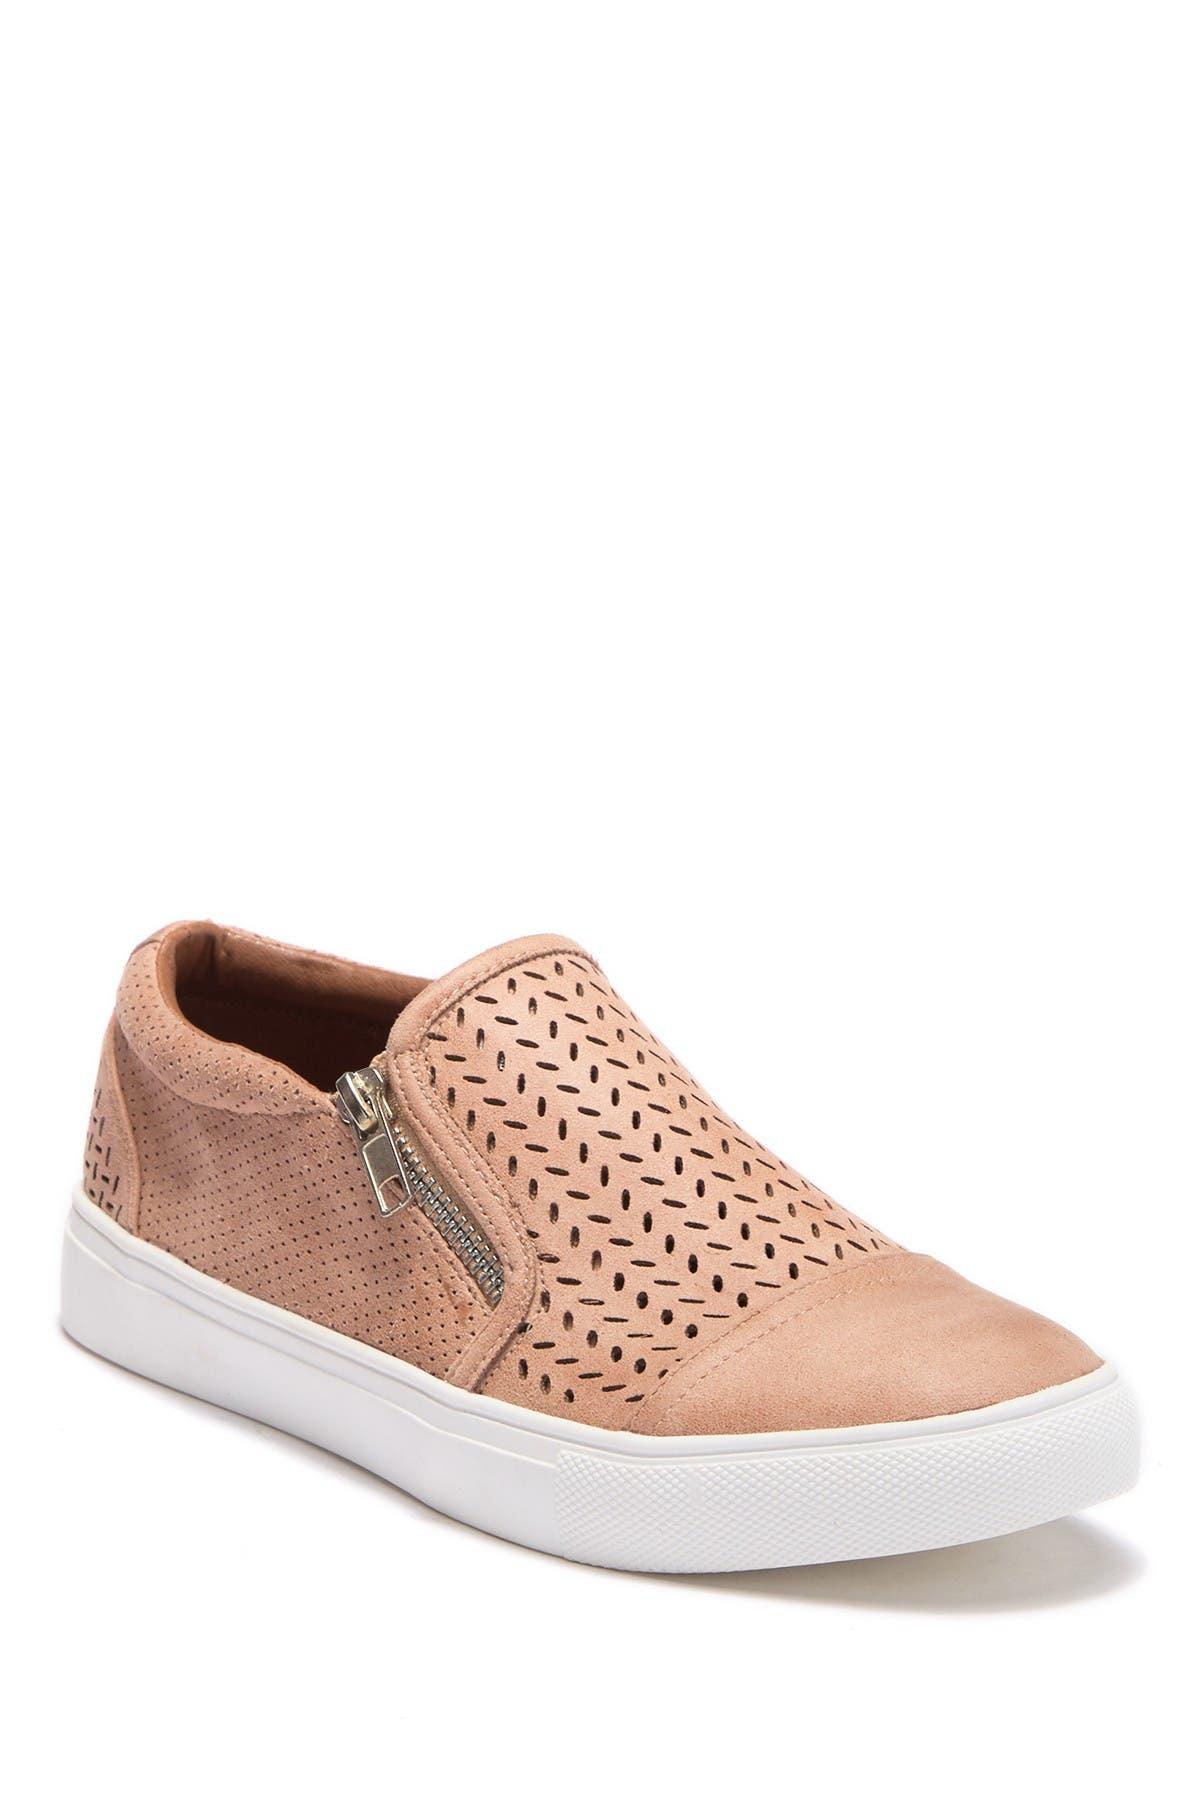 Report | Alexa Perforated Zip Sneaker